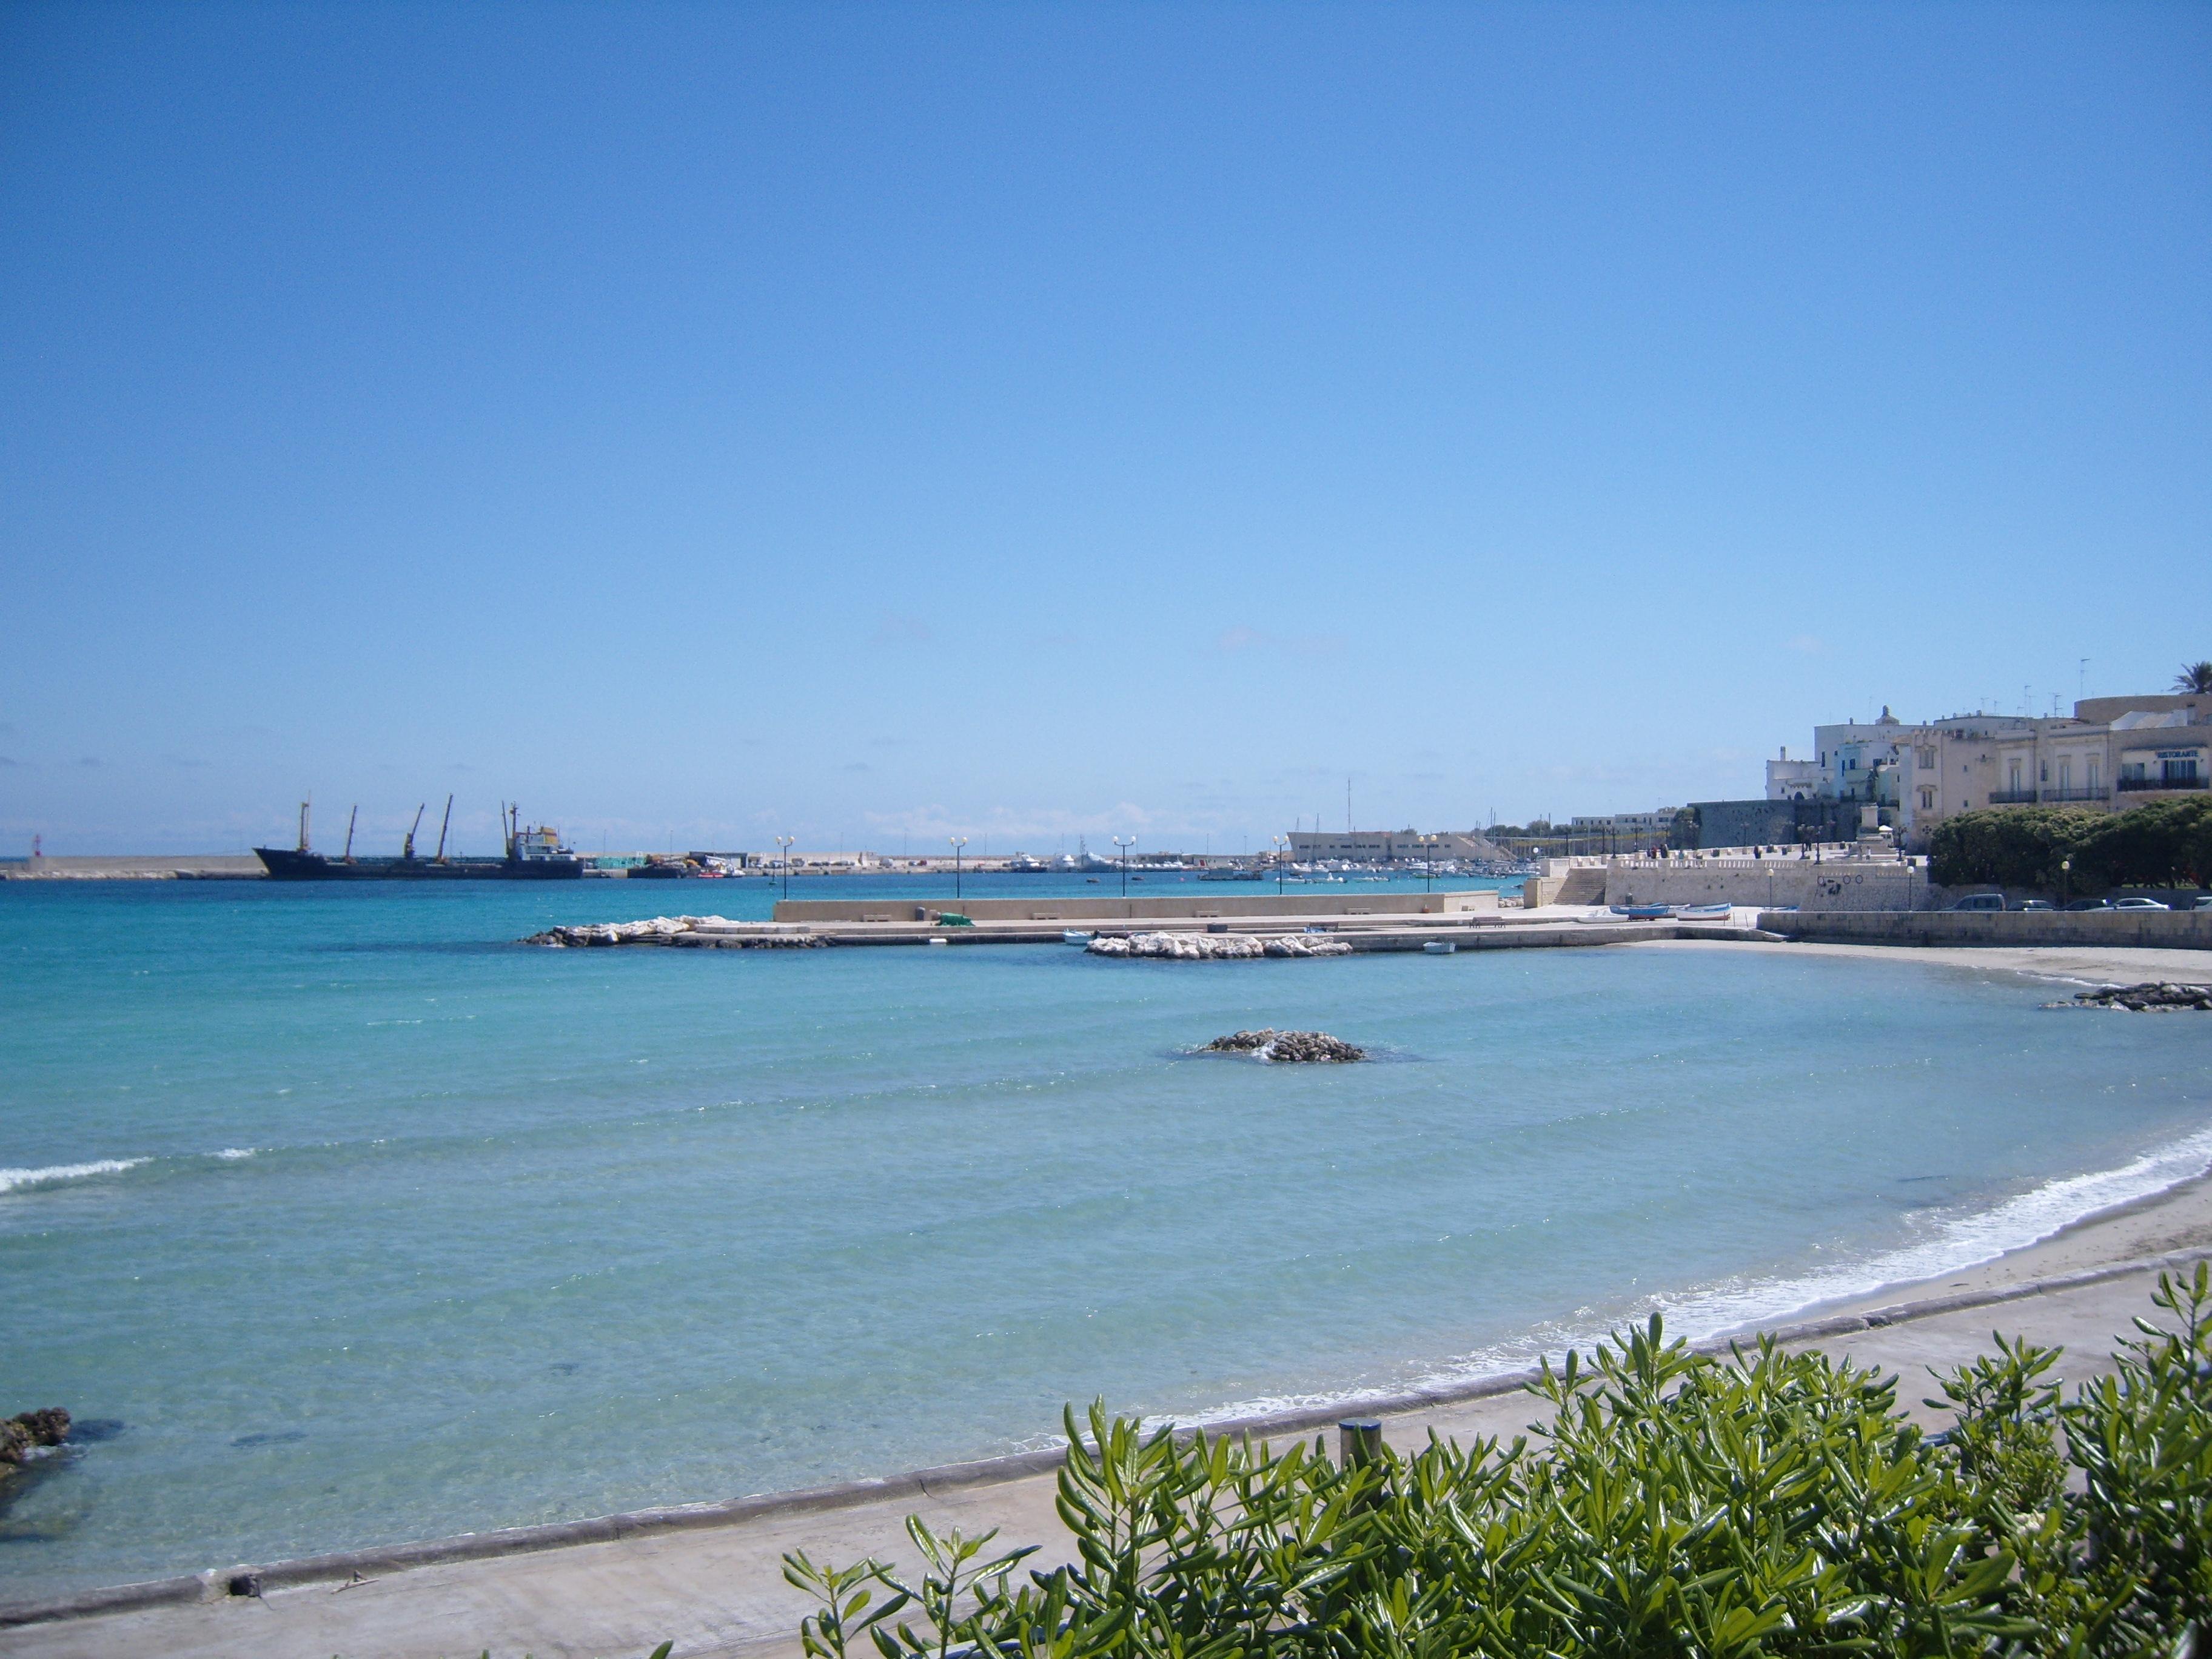 File:Otranto.JPG - Wikimedia Commons